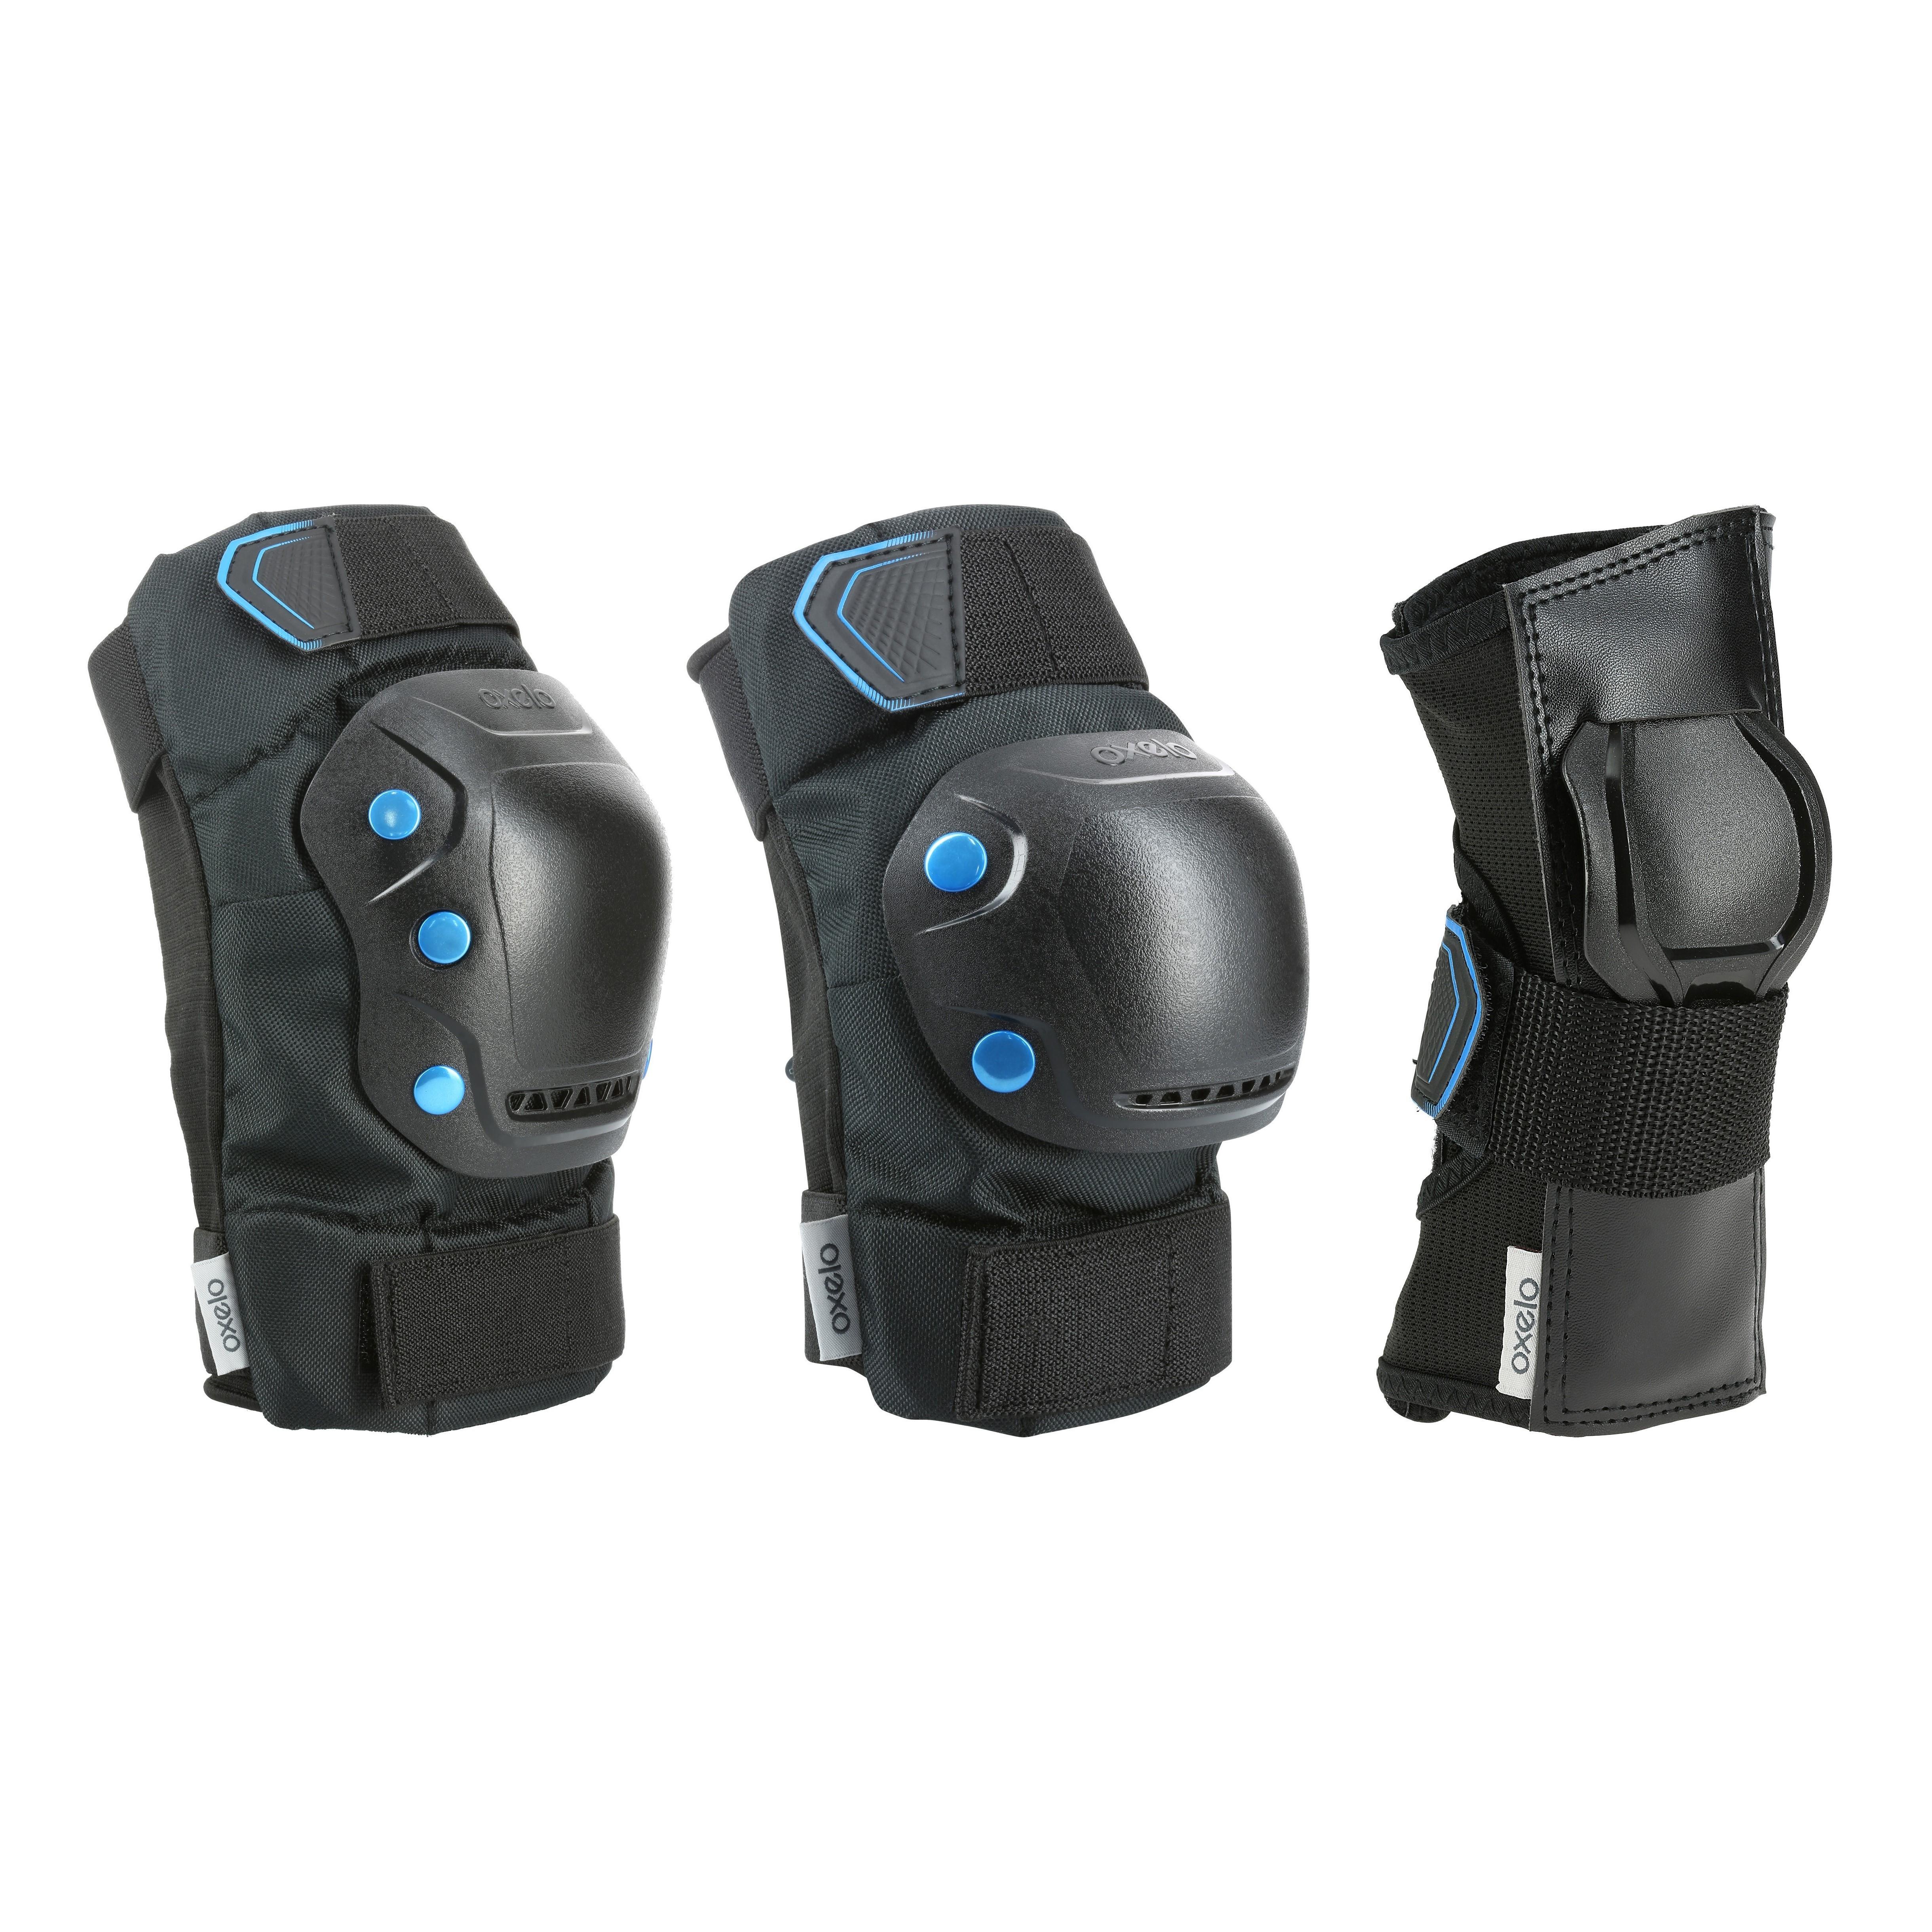 Set 3 protecciones patinaje adulto FIT 5 negro azul